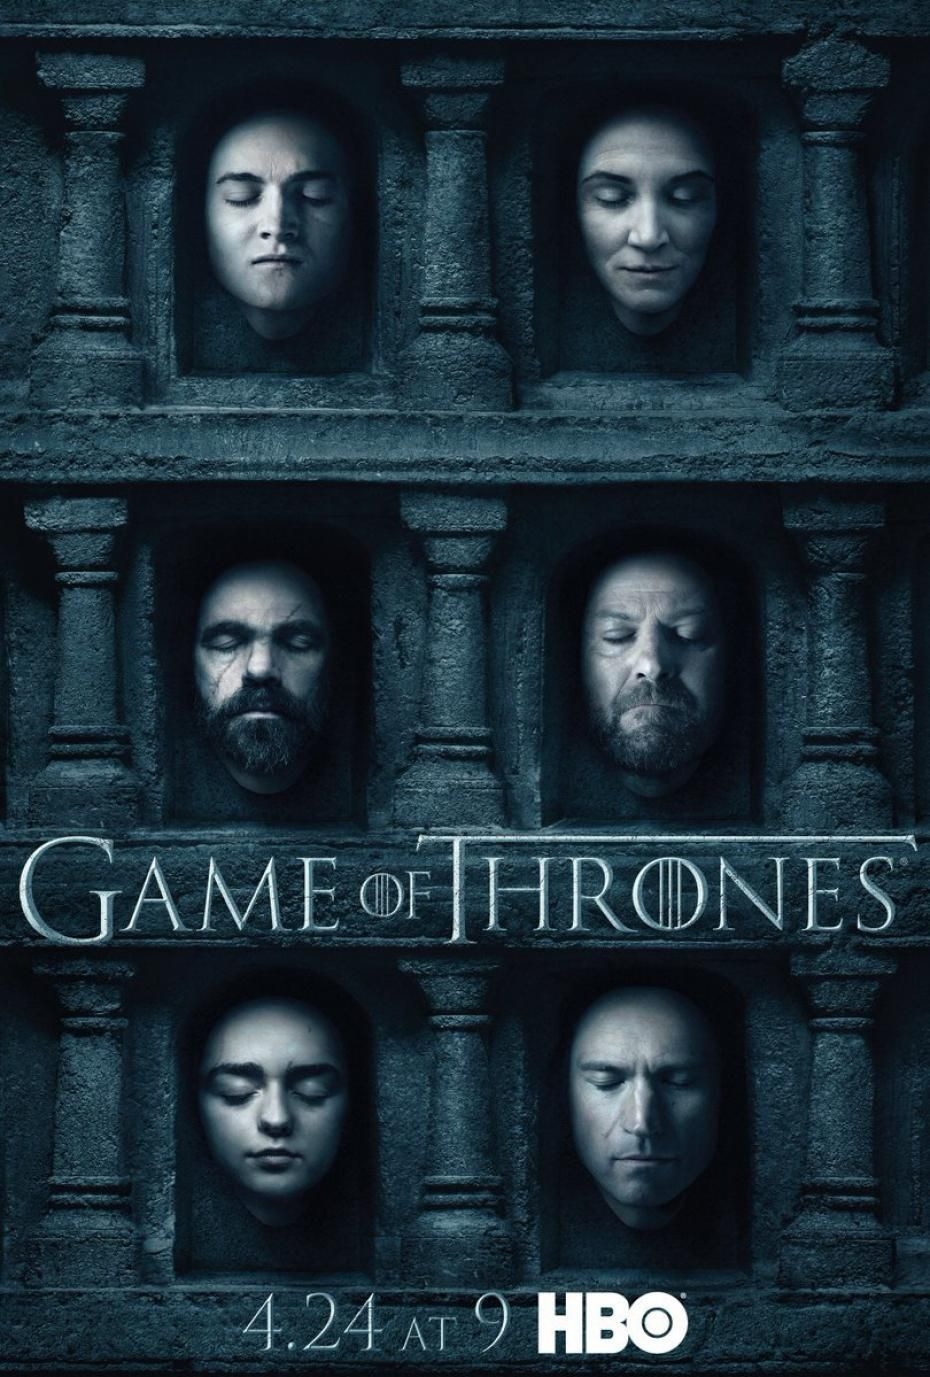 Game Of Thrones Saison 6 Streaming Vf : thrones, saison, streaming, Thrones, Saison, 6SERIE, STREAMING, Thrones,, Saison,, Streaming